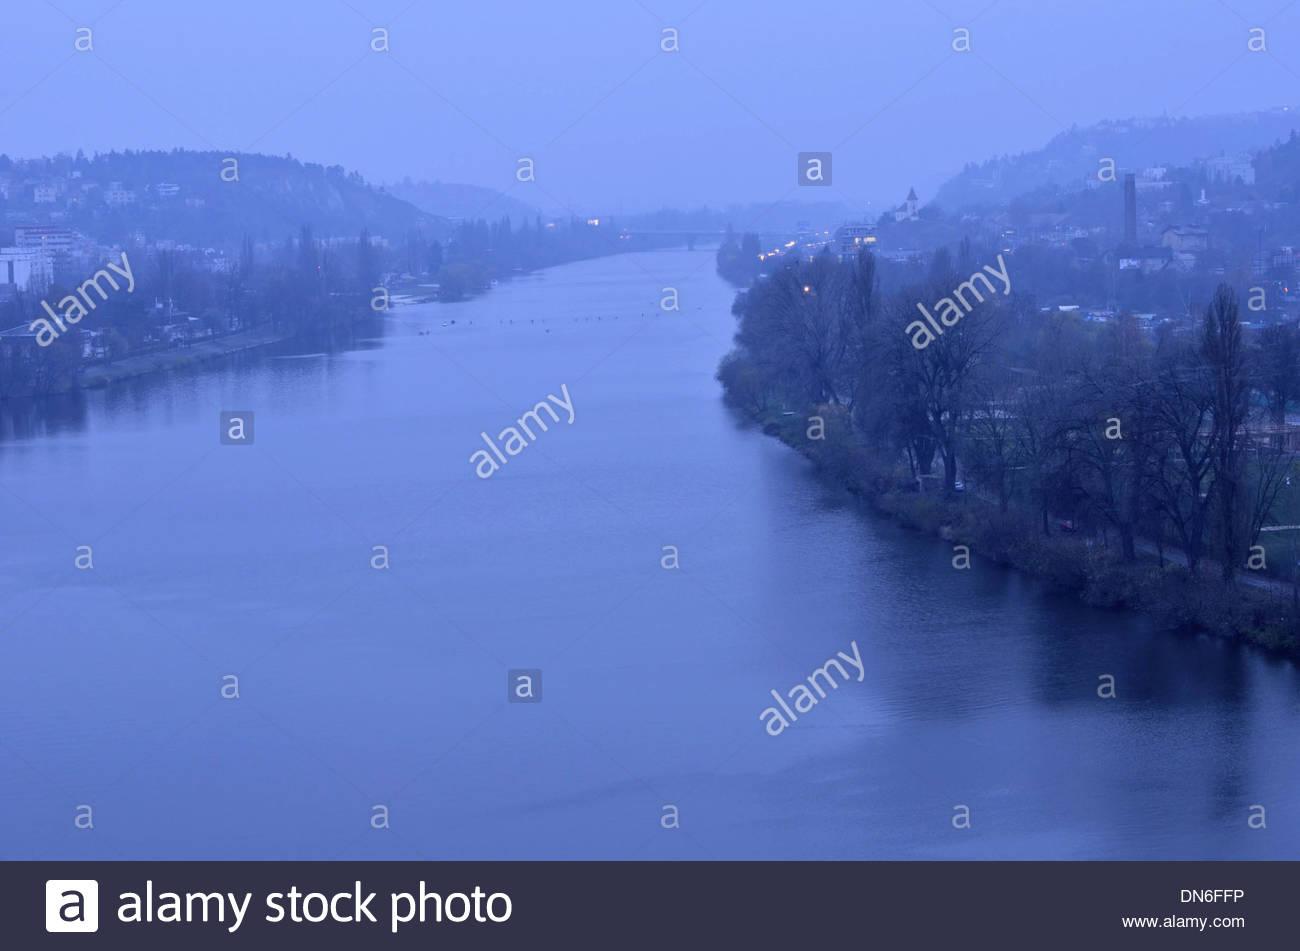 River Vltava (Moldau) at dusk cloudy rainy winter in Prague Czech Republic. - Stock Image